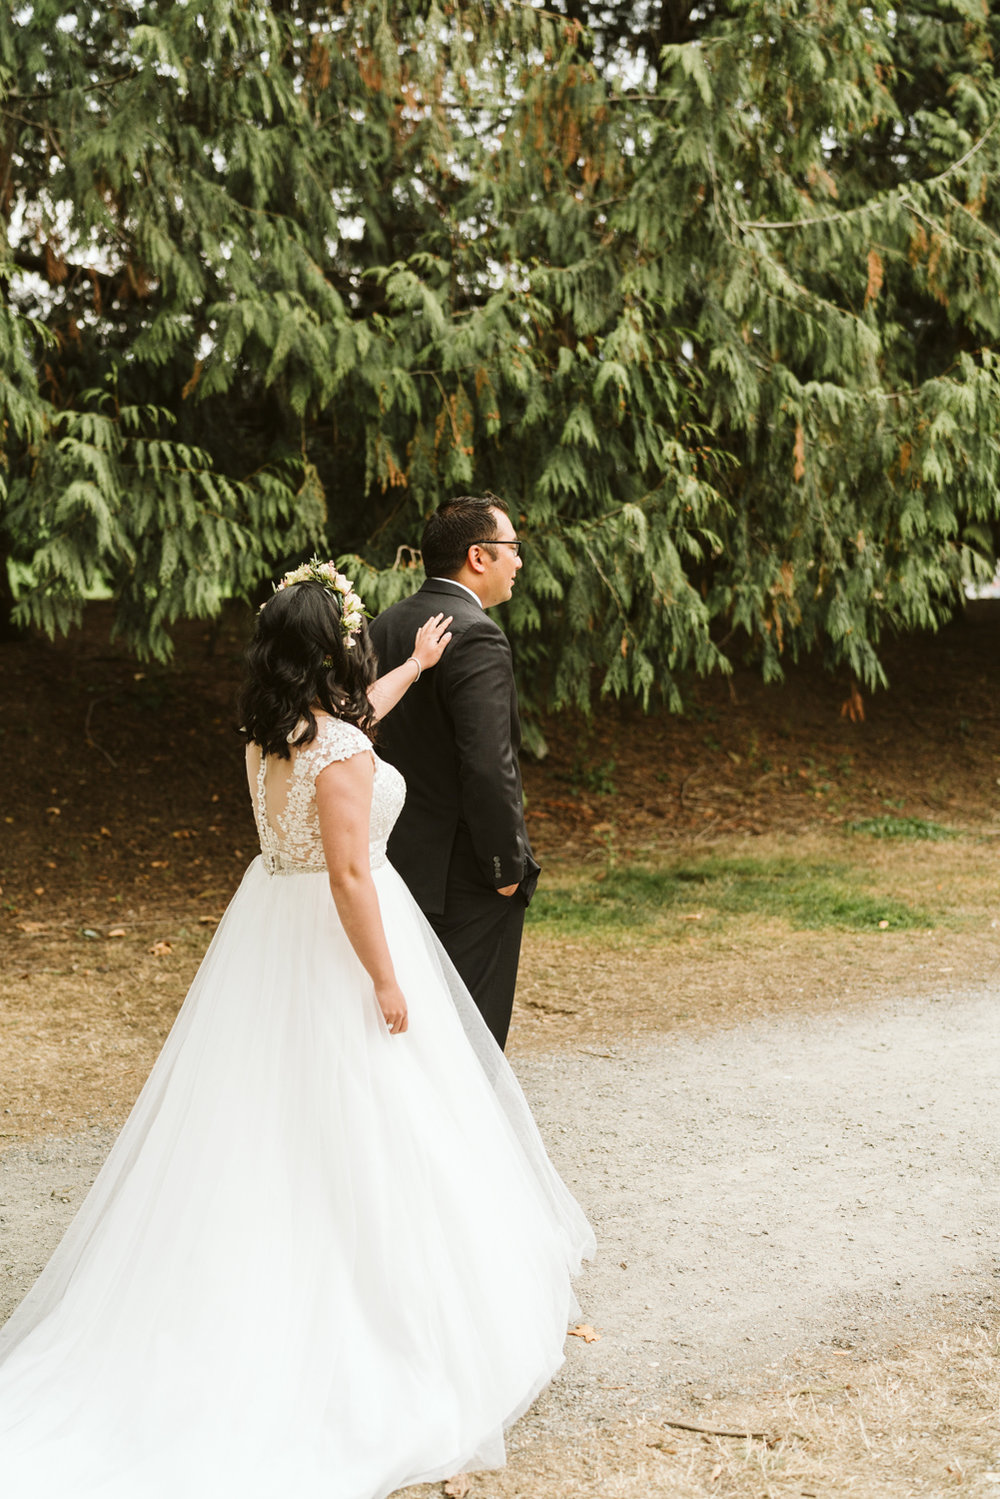 April Yentas Photography - Nina & Chris slideshow-3.jpg